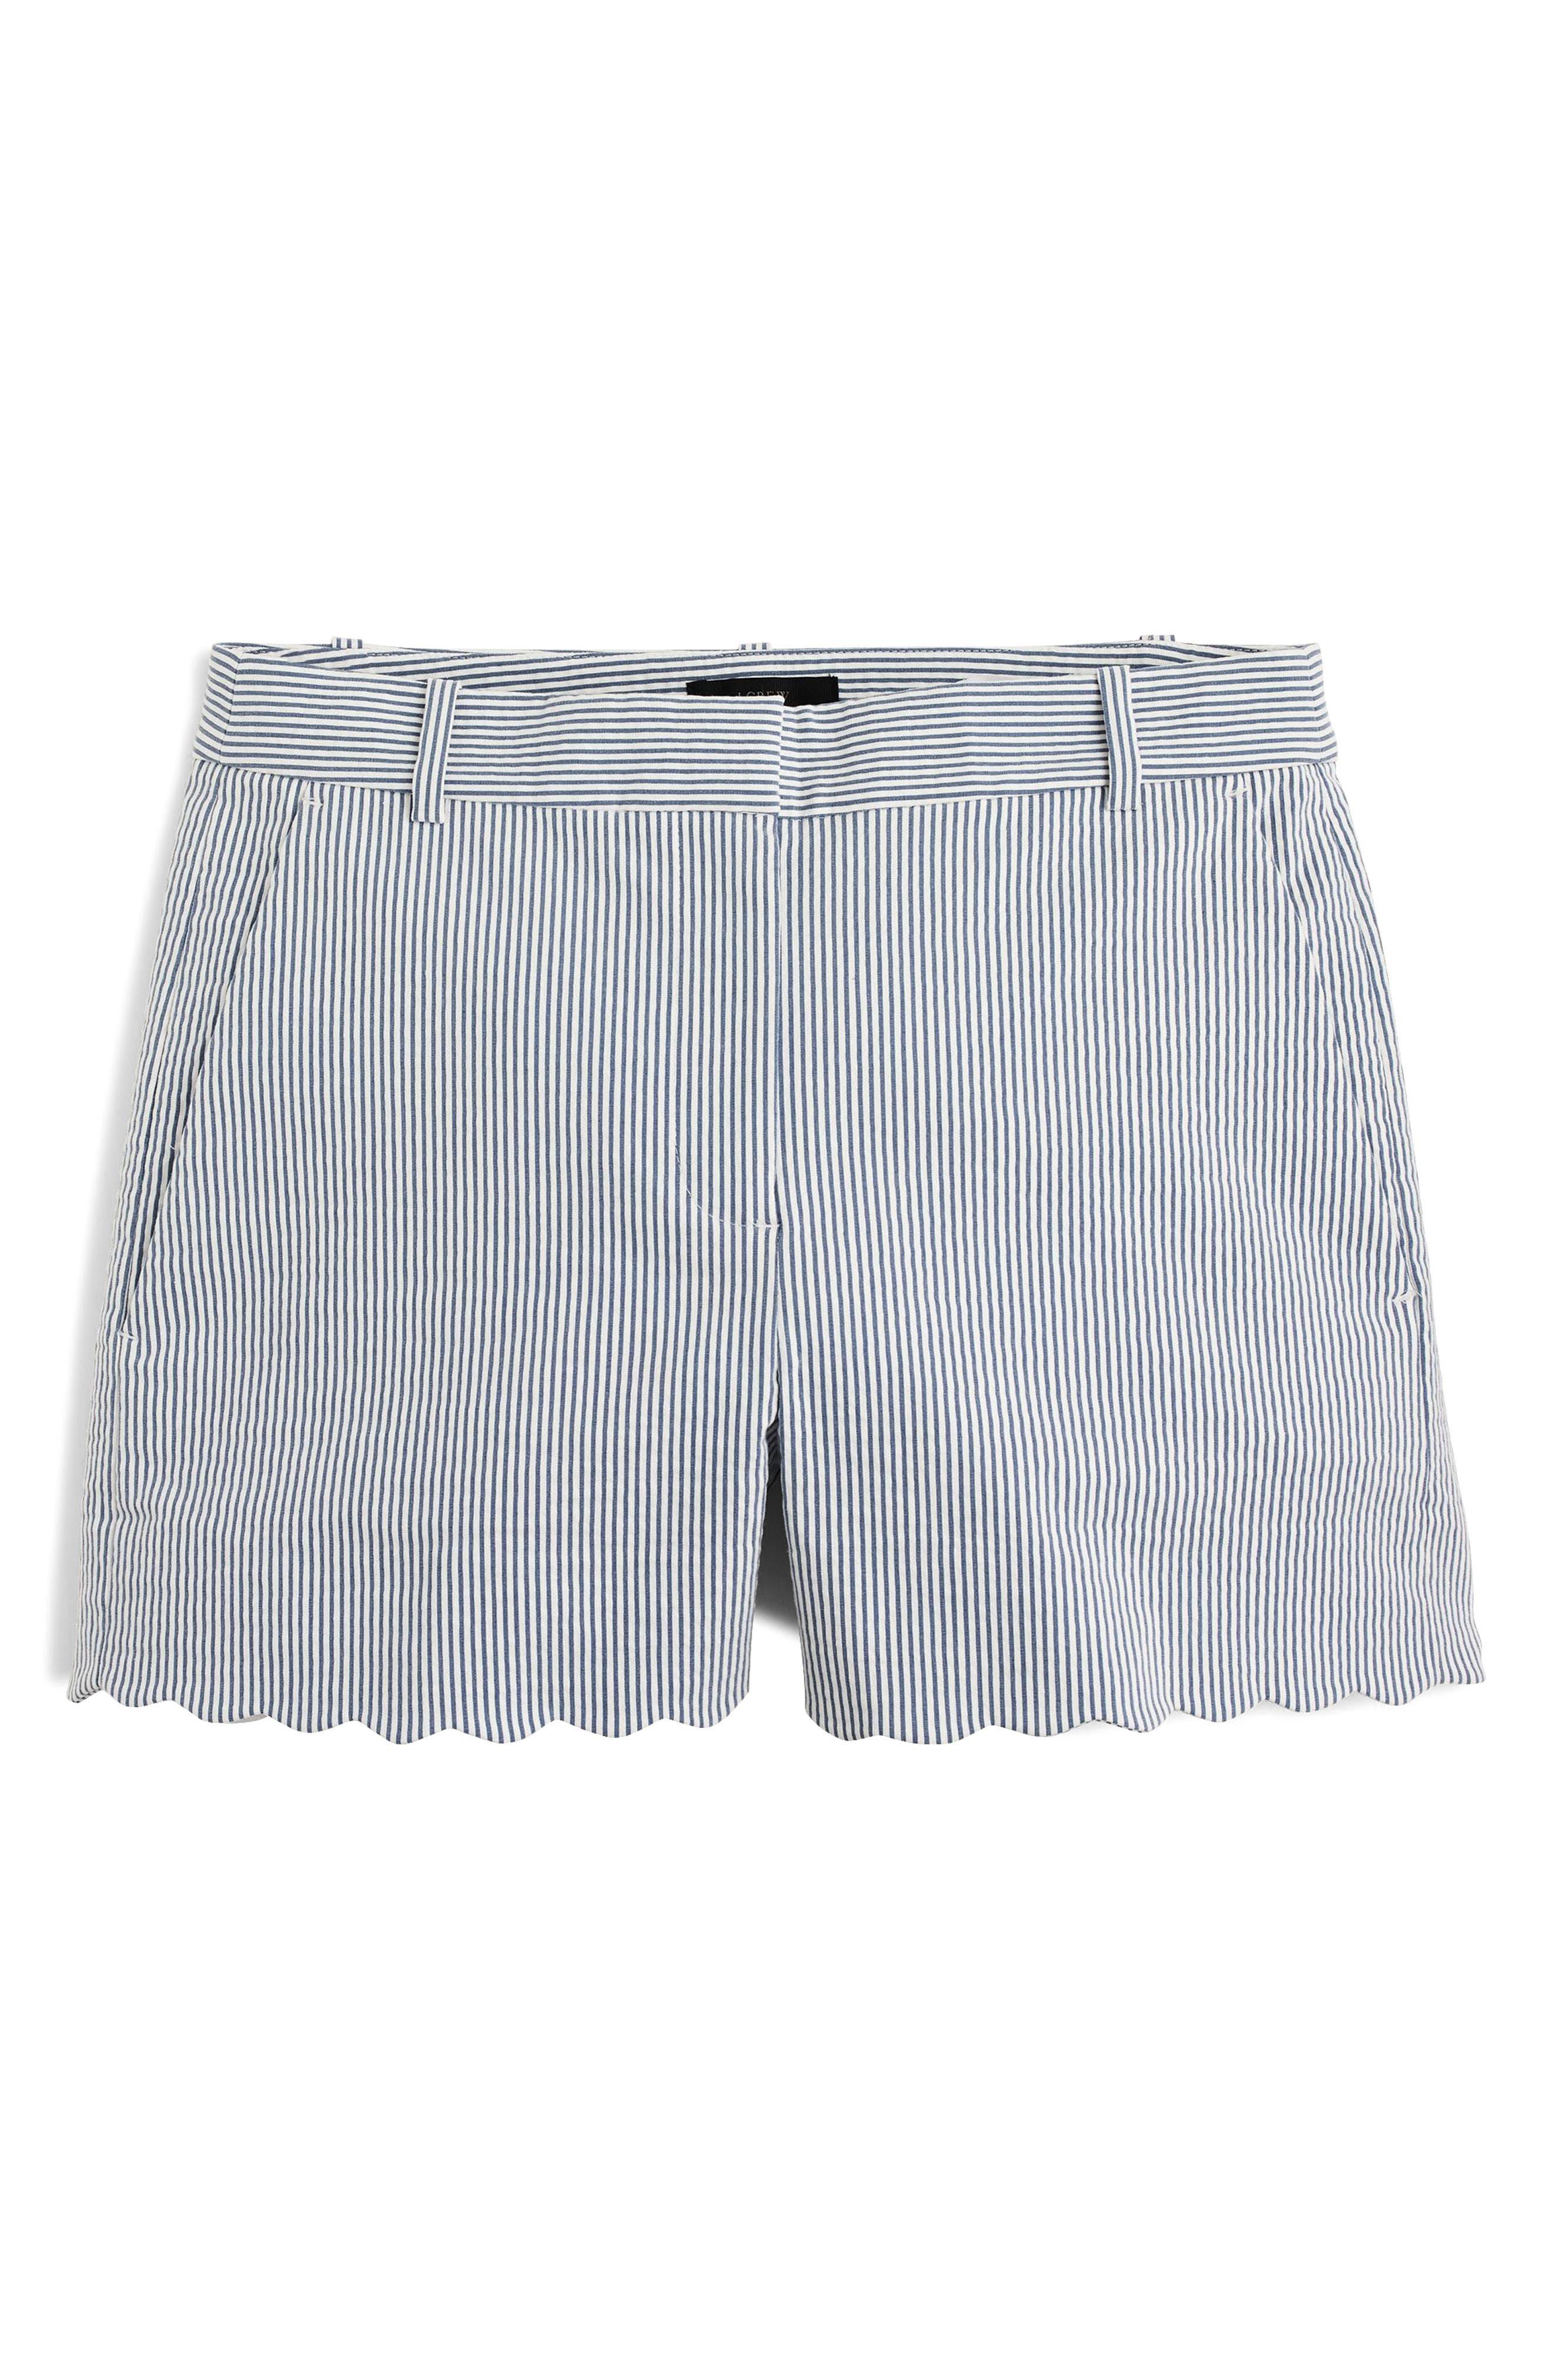 J.Crew Fiesta Seersucker Scallop Hem Shorts,                             Alternate thumbnail 2, color,                             Blue White